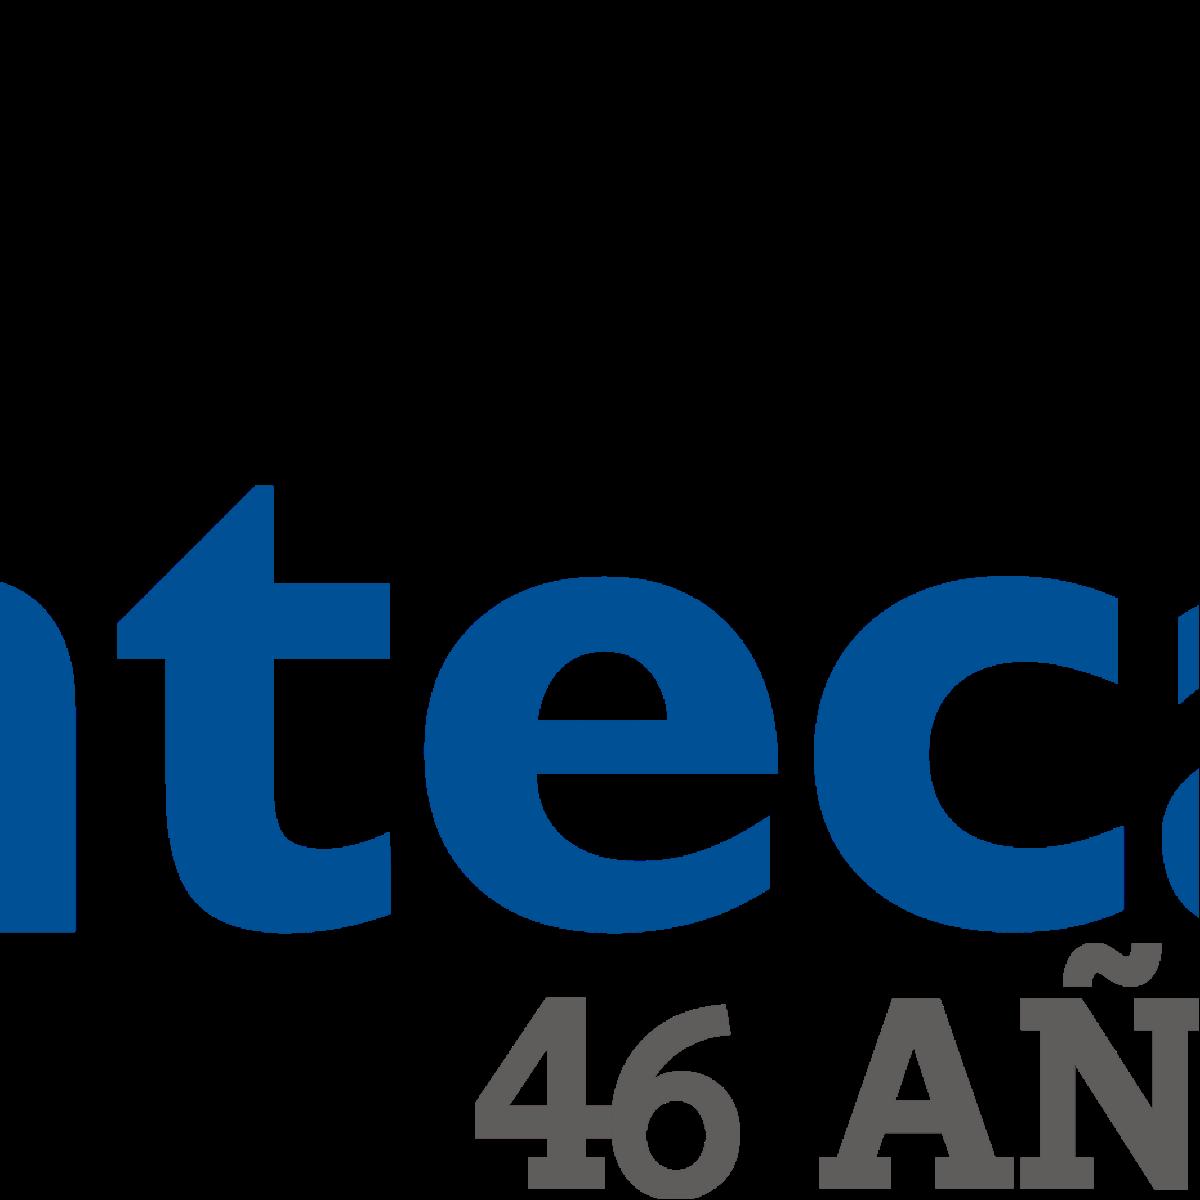 logo_INTECAP Huehuetenango